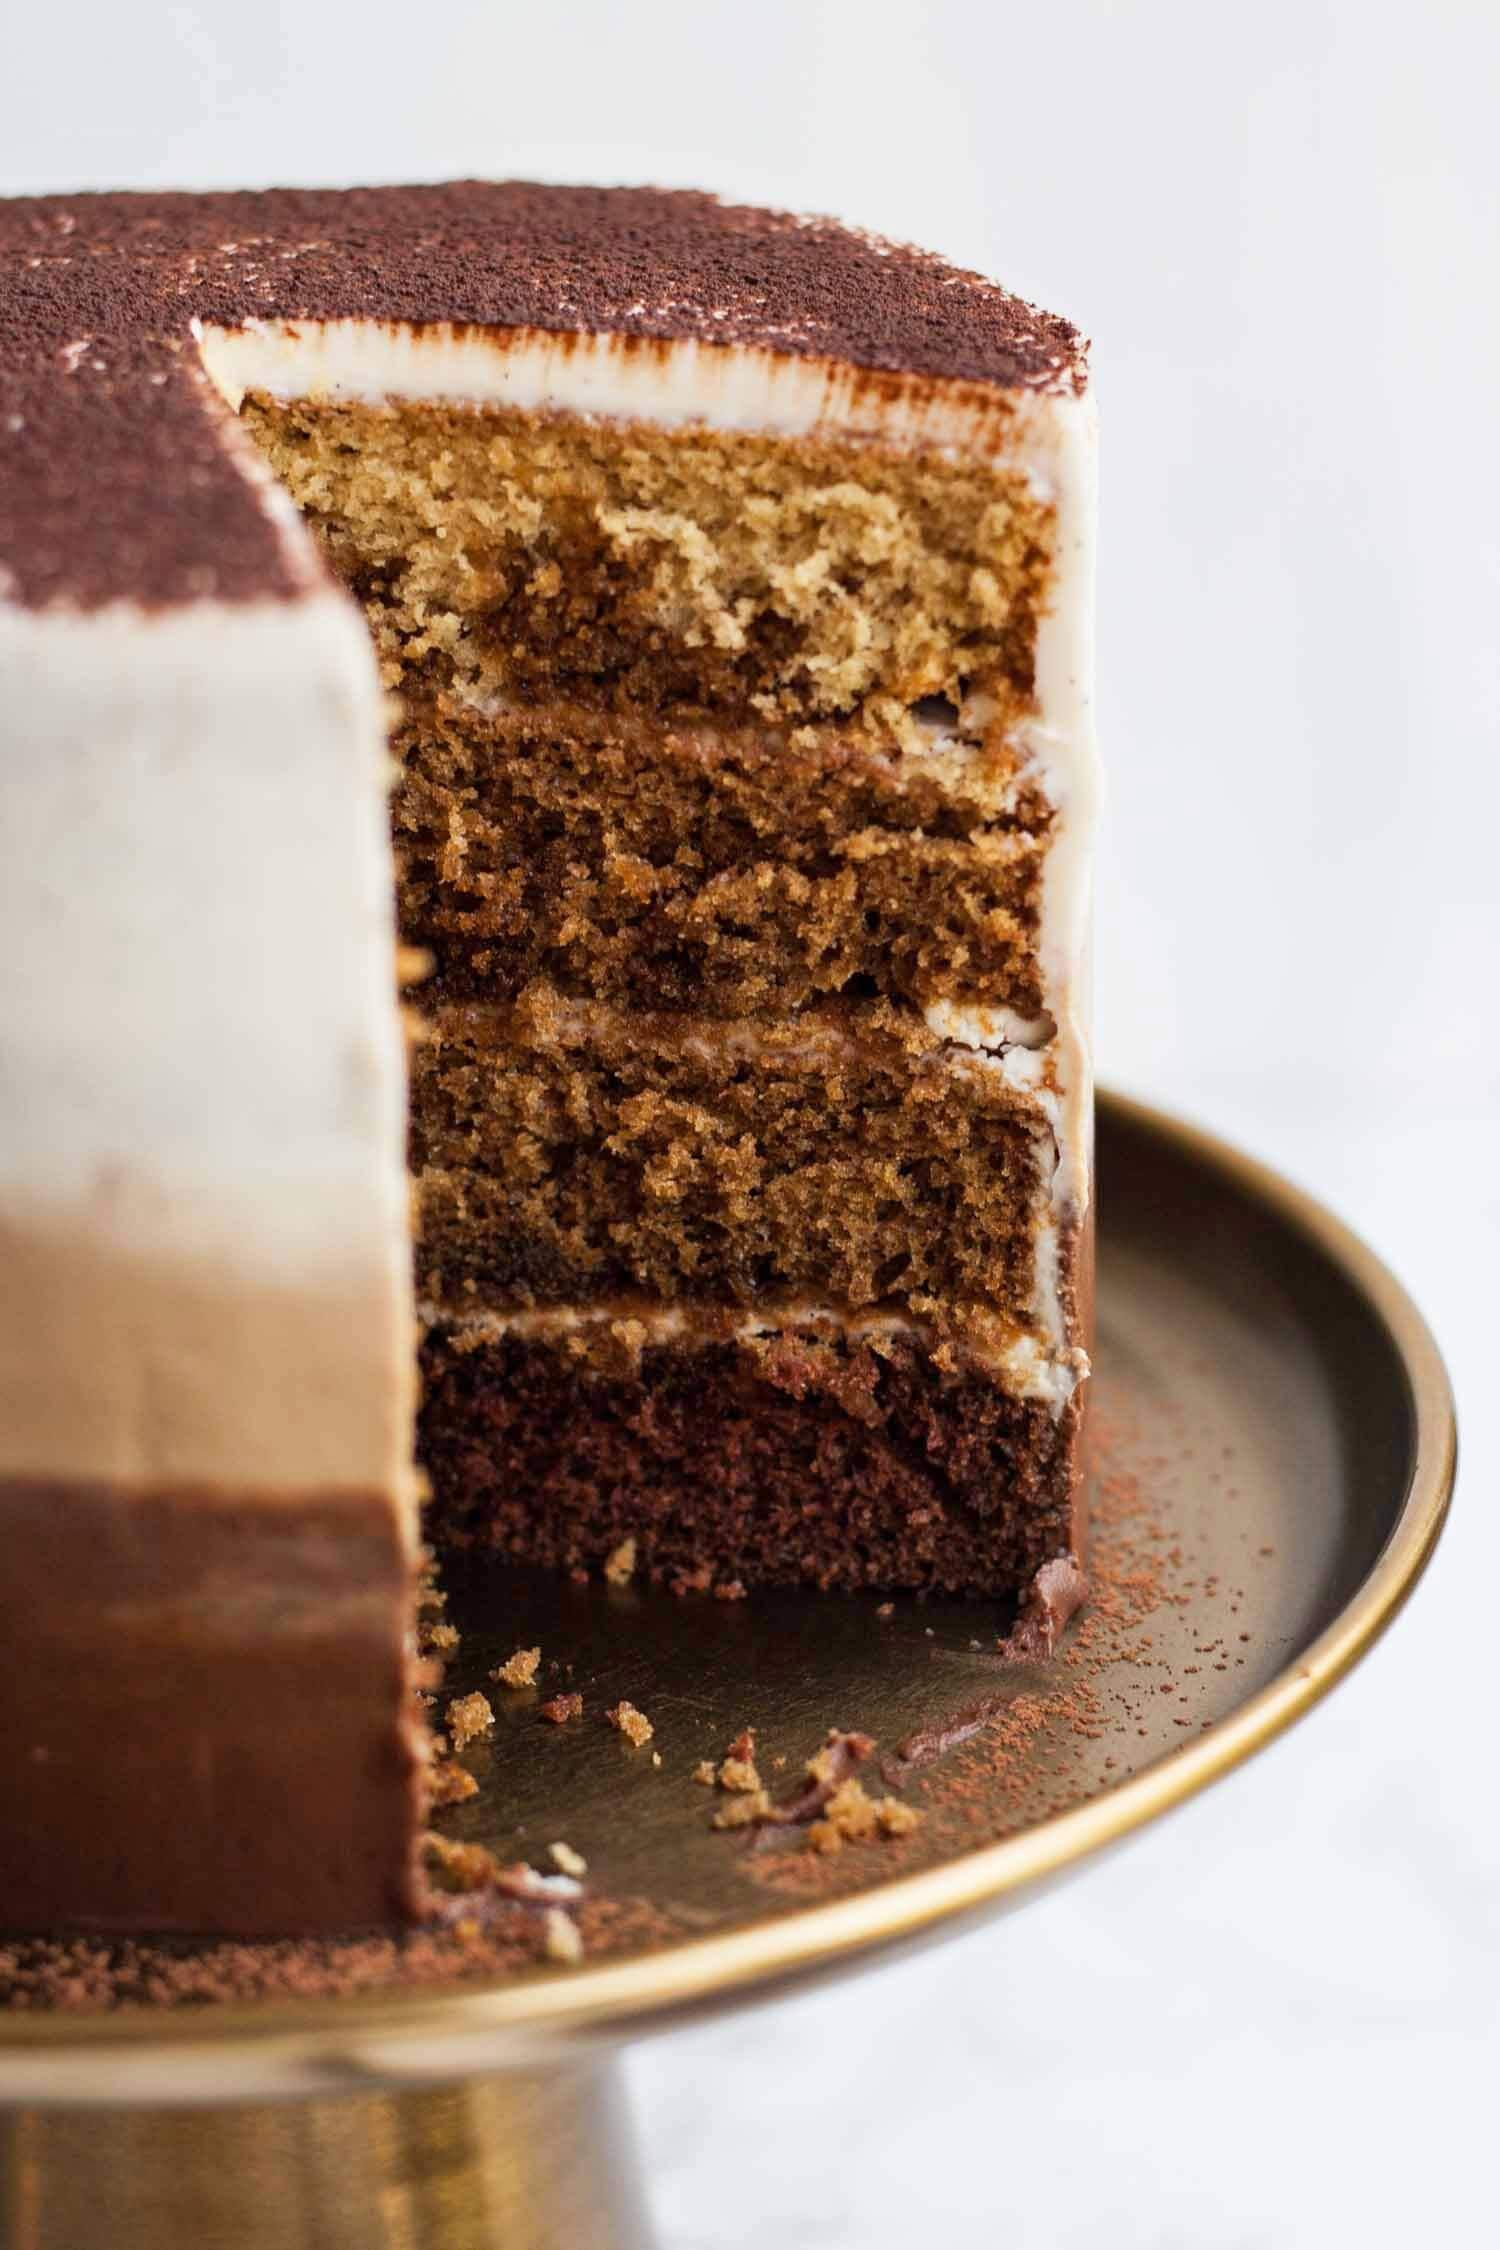 Best ideas about Tiramisu Birthday Cake . Save or Pin Tiramisu Layer Cake with Ombre Mascarpone Frosting Eat Now.